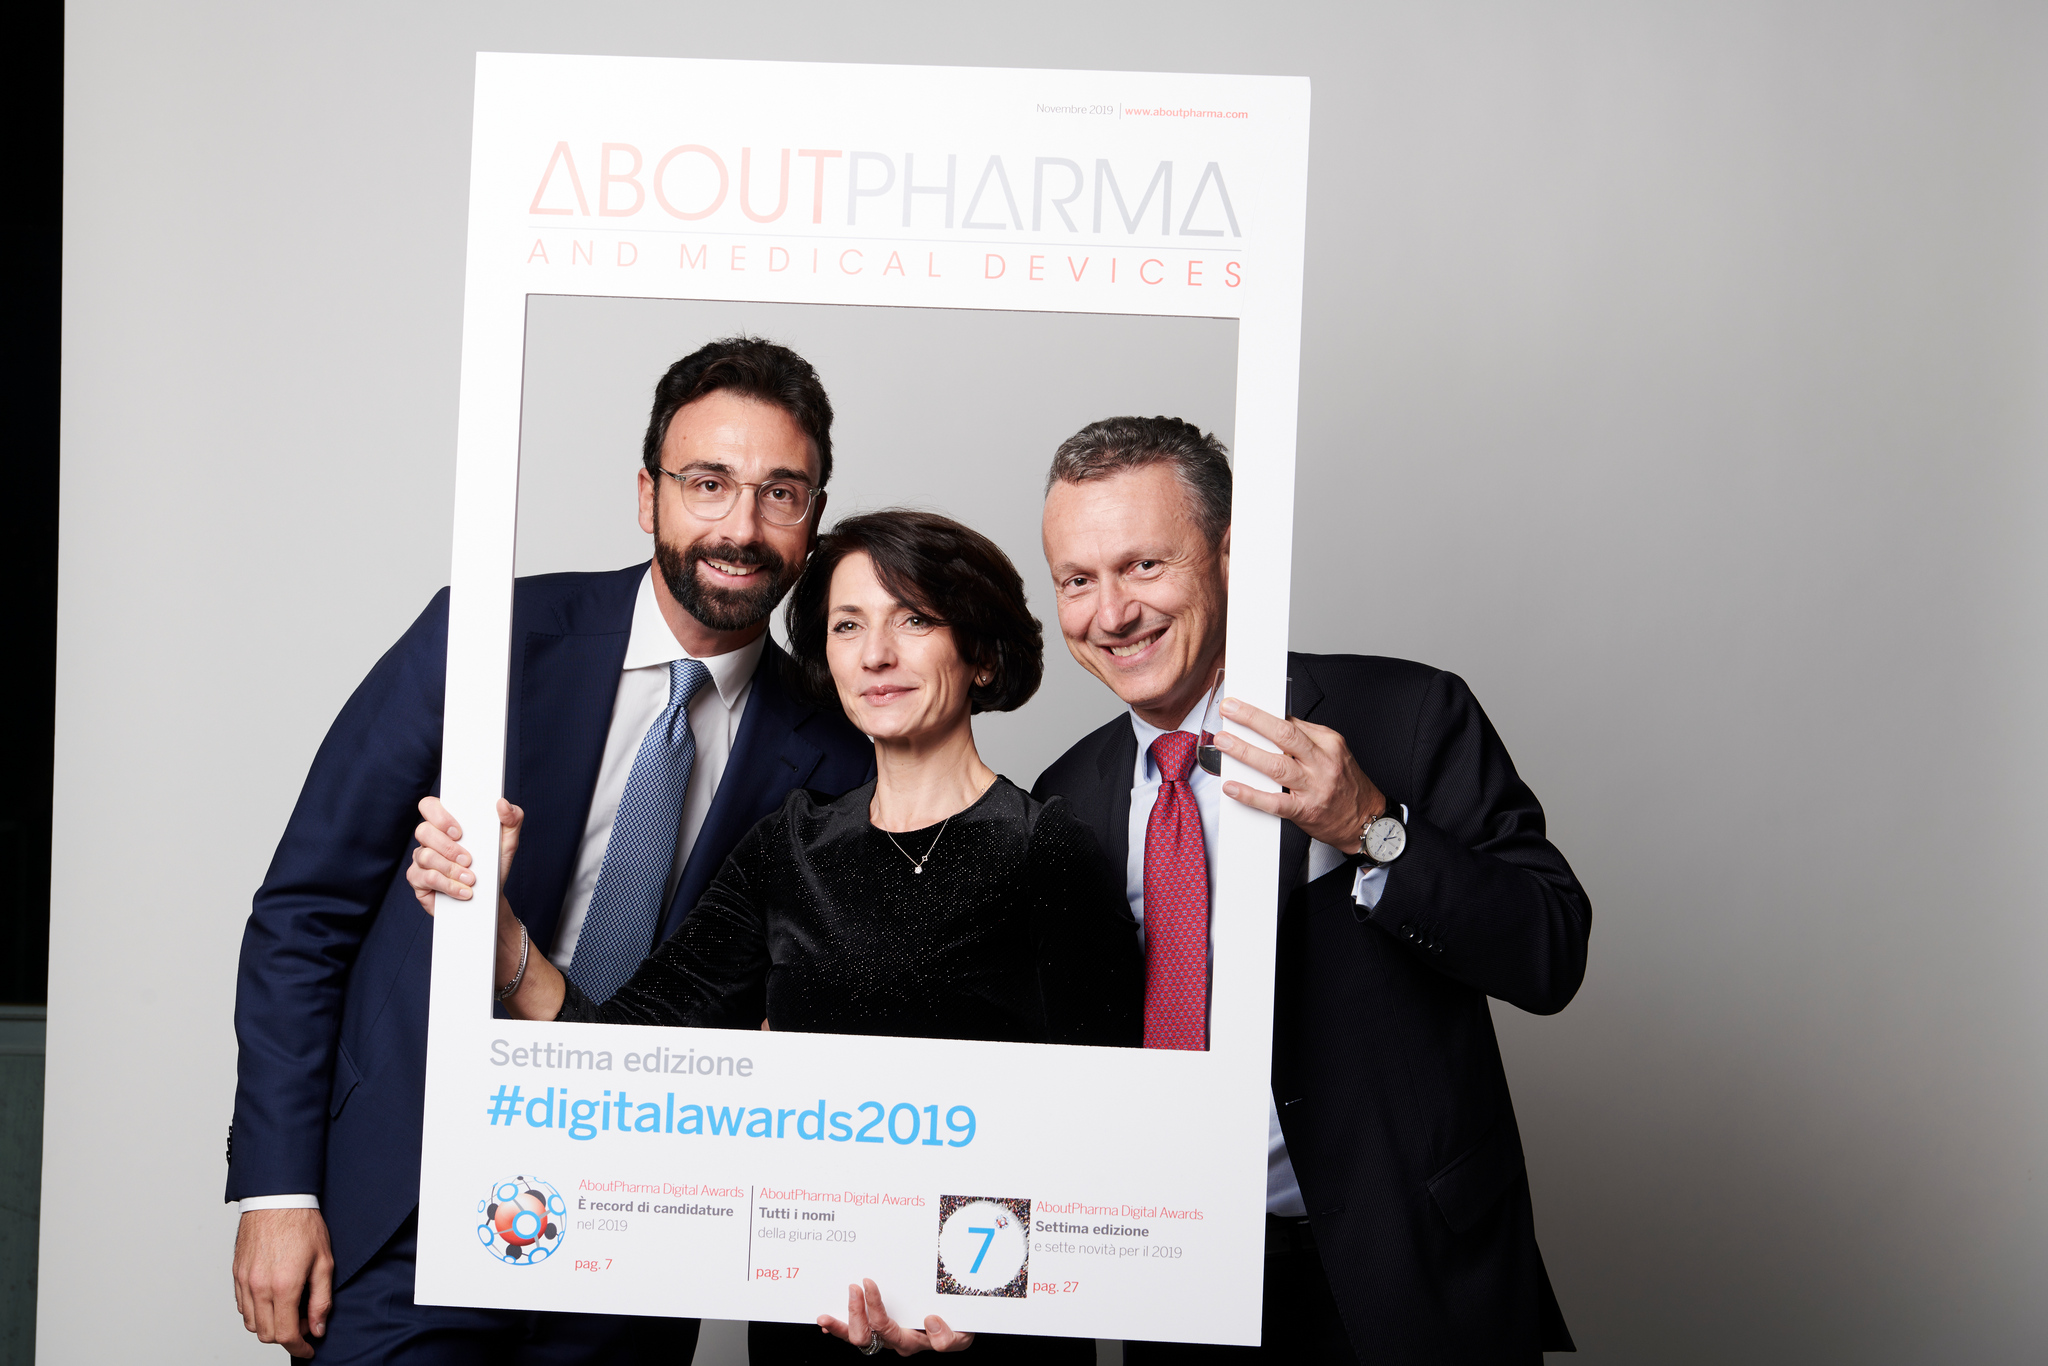 Photobooth AboutPharma Digital Awards 2019_17